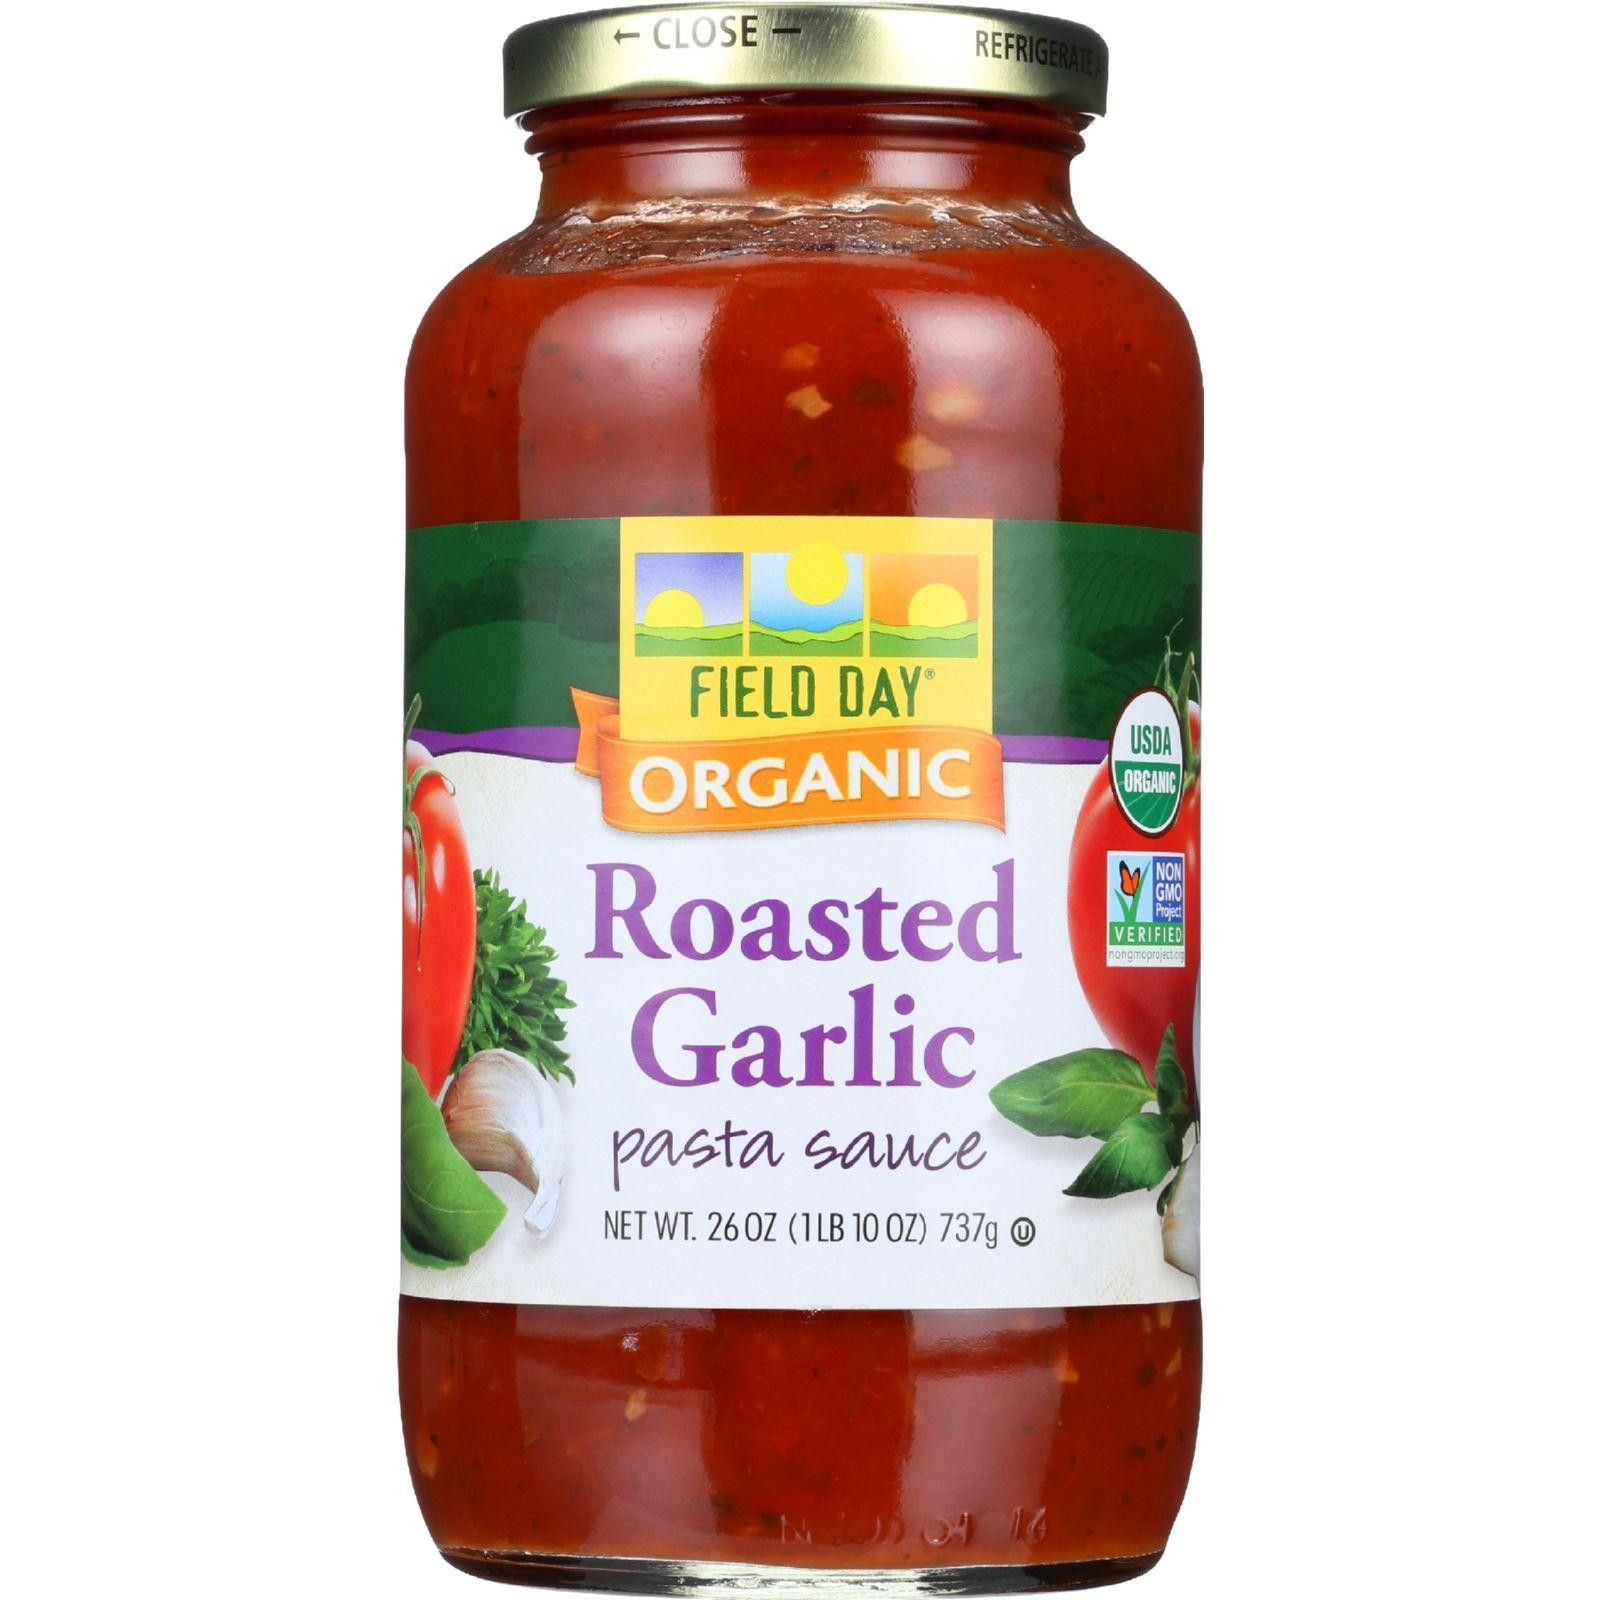 Field Day Pasta Sauce - Organic - Roasted Garlic - 26 Oz - Case Of 12